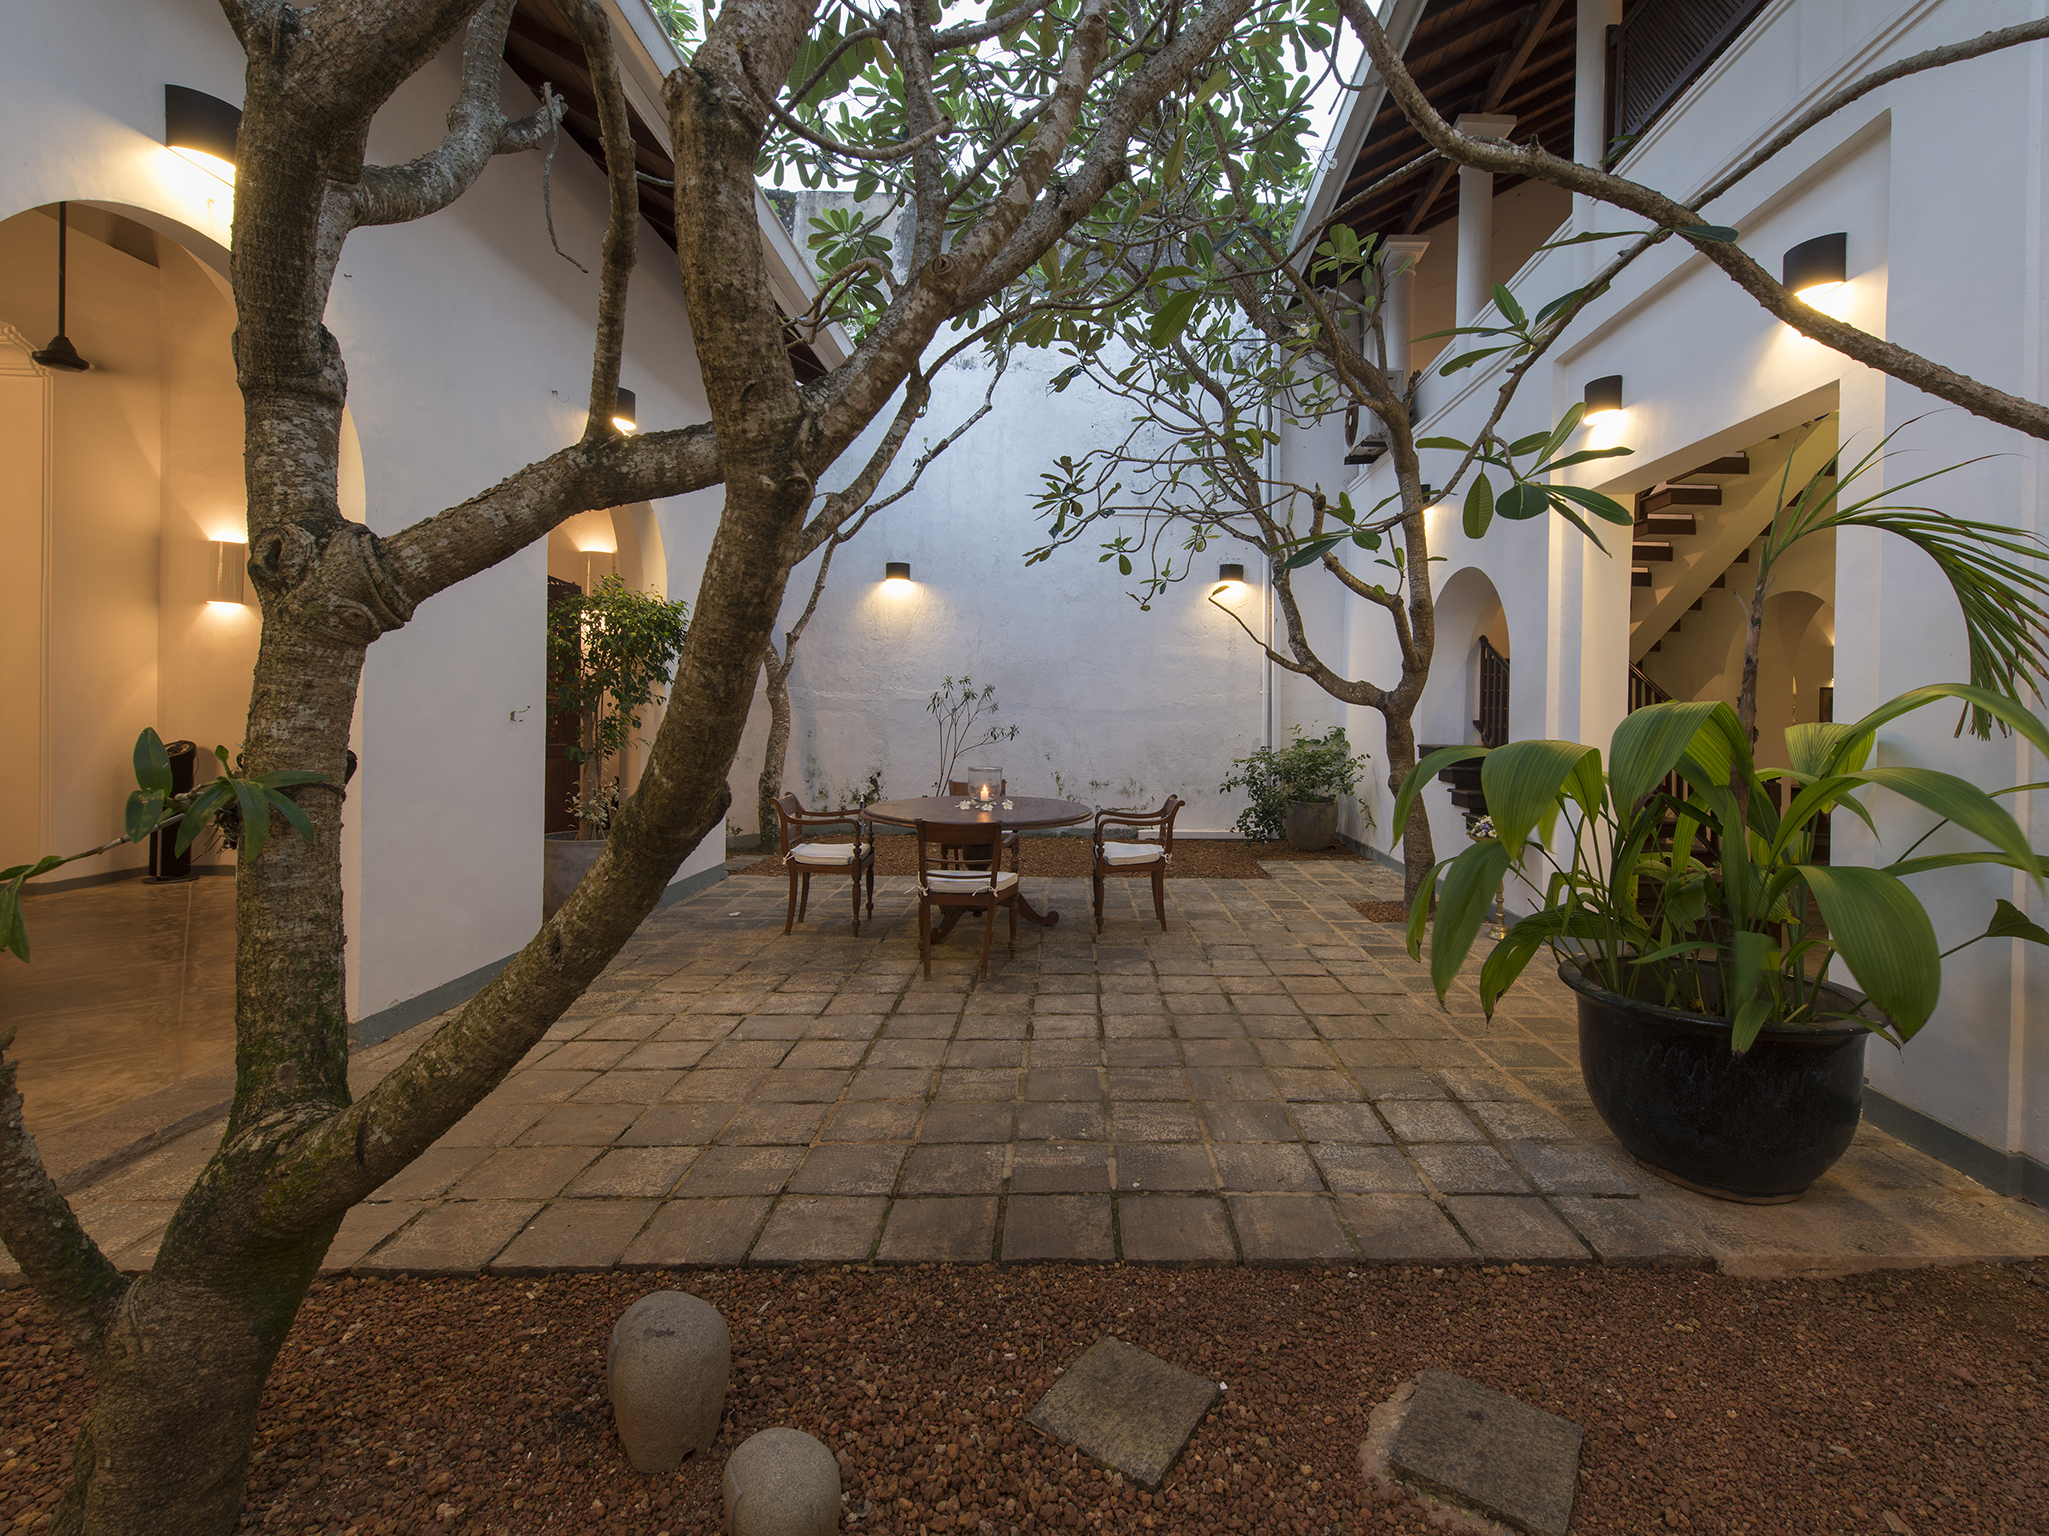 04-Ambassadors House-Galle - Courtyard at dusk.jpg